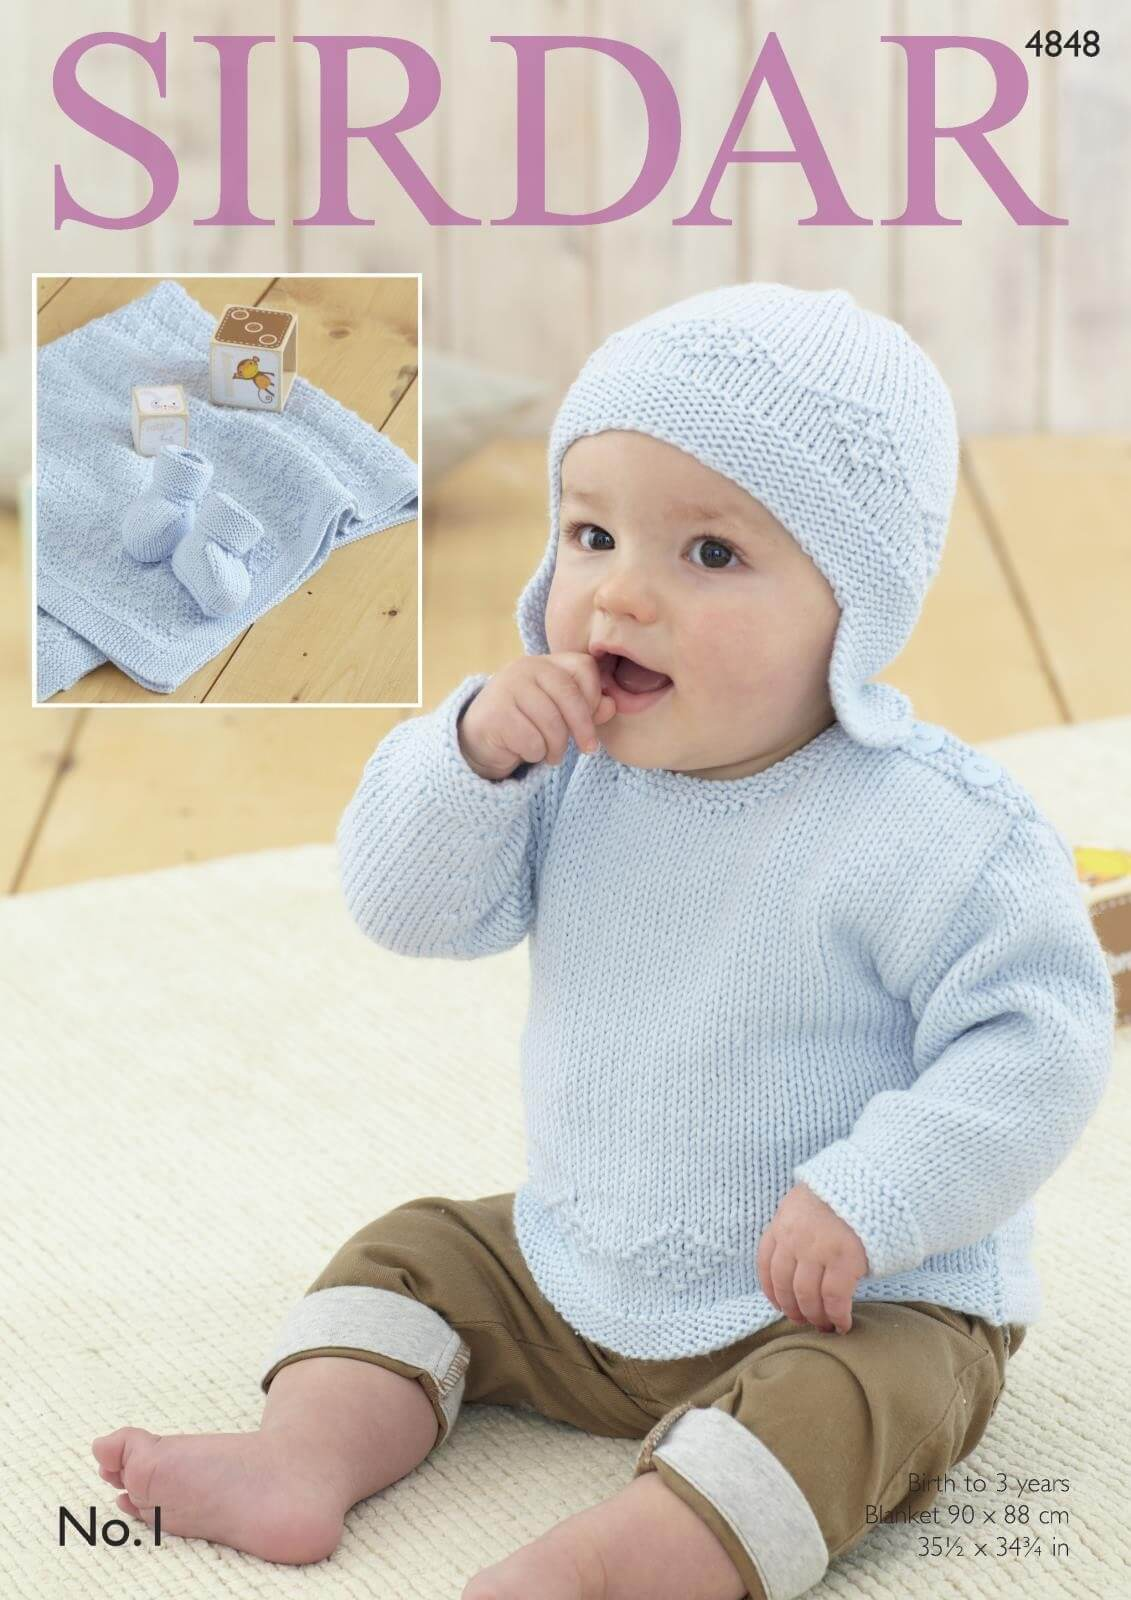 Sirdar Knitting Pattern 4848 Baby Bonnet Blanket Cardigan